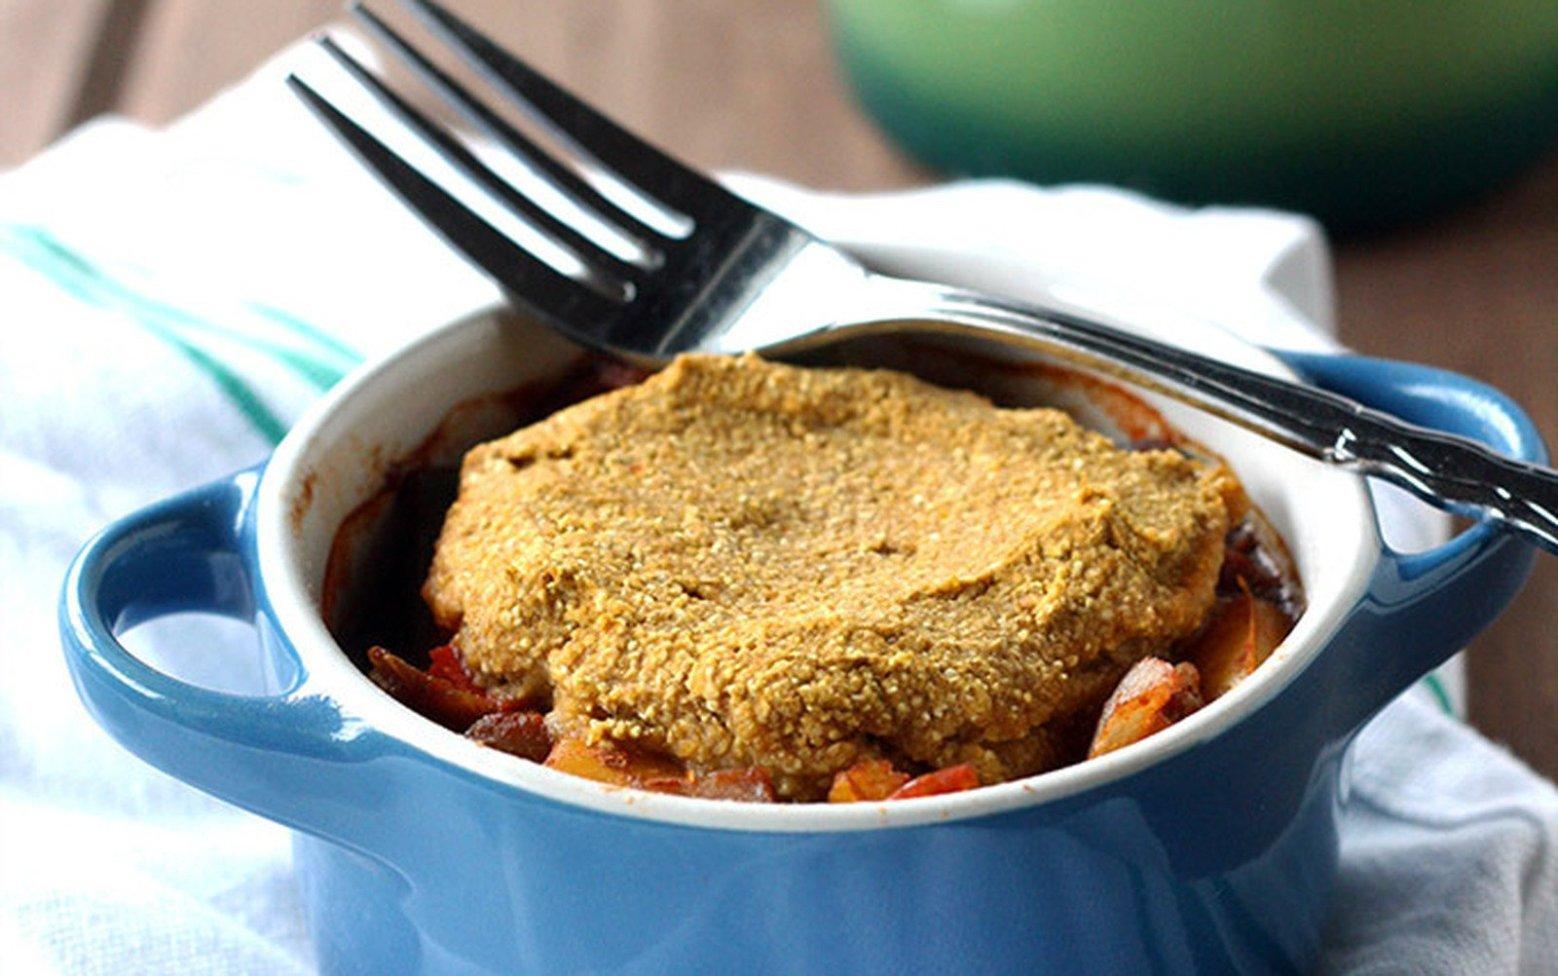 Vegan Lentil Chili Pot Pie With Pumpkin Cornbread Topping